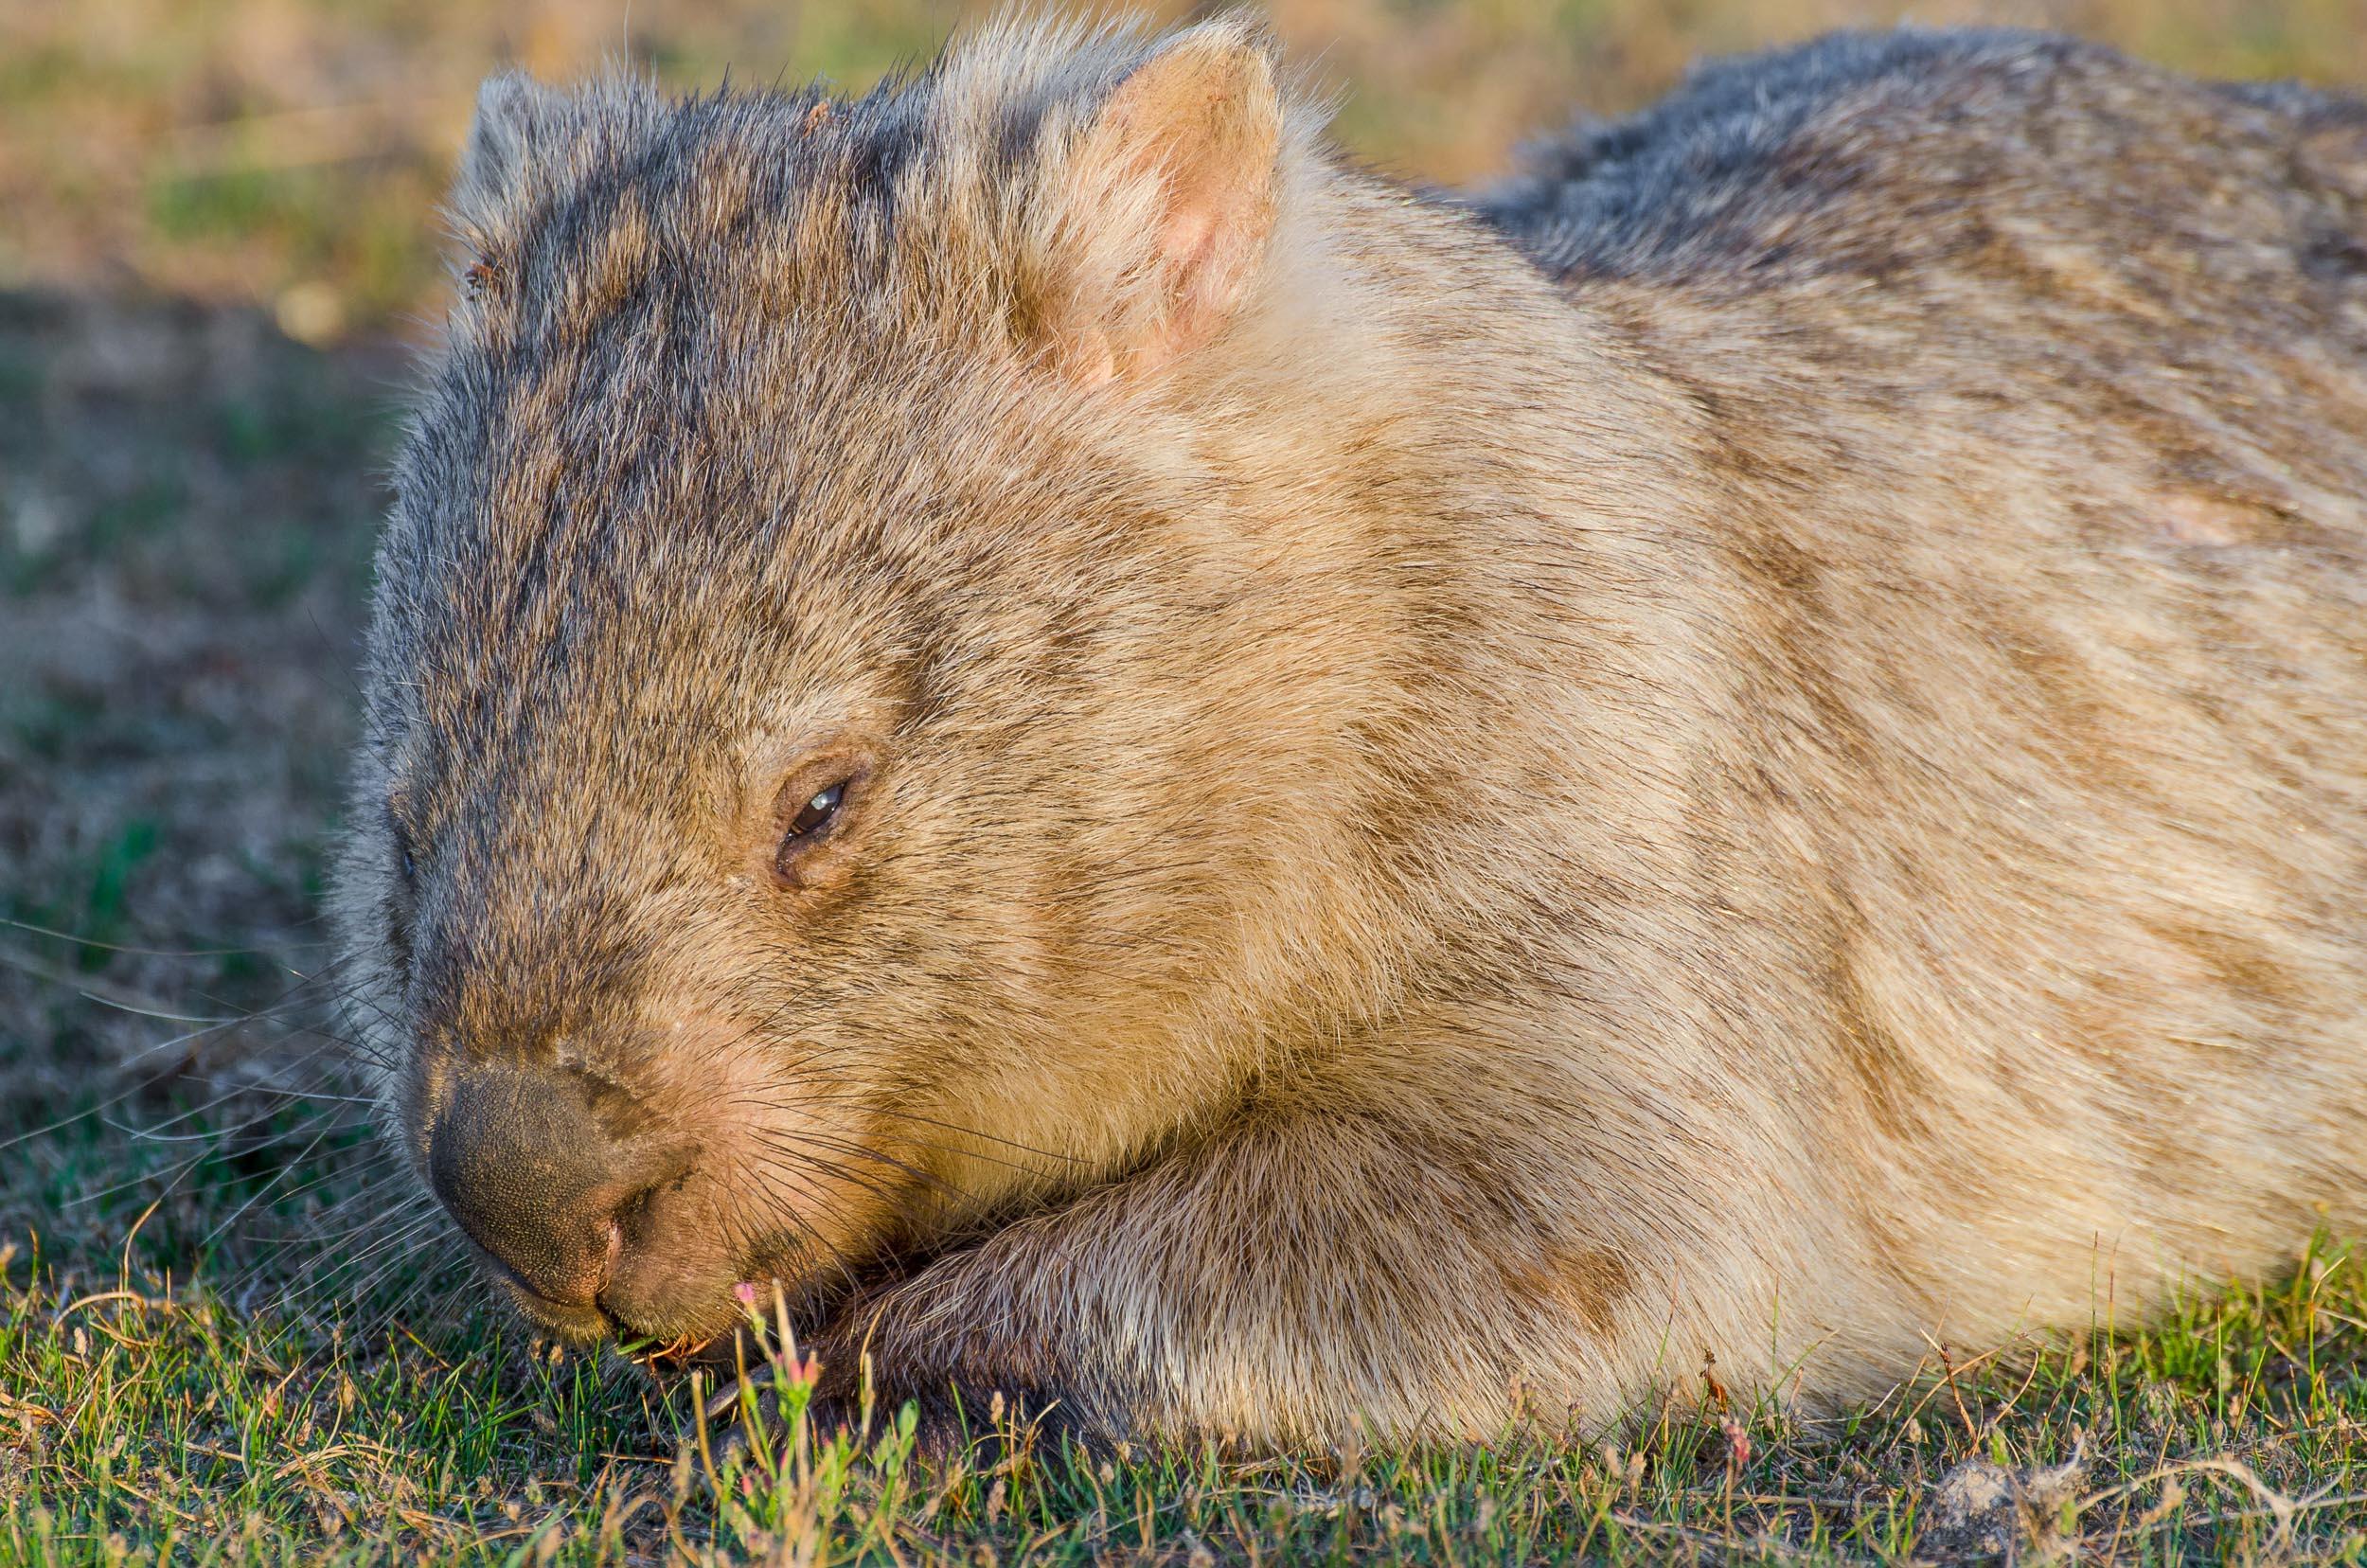 wombat wilsons promontory road trip sydney-melbourne